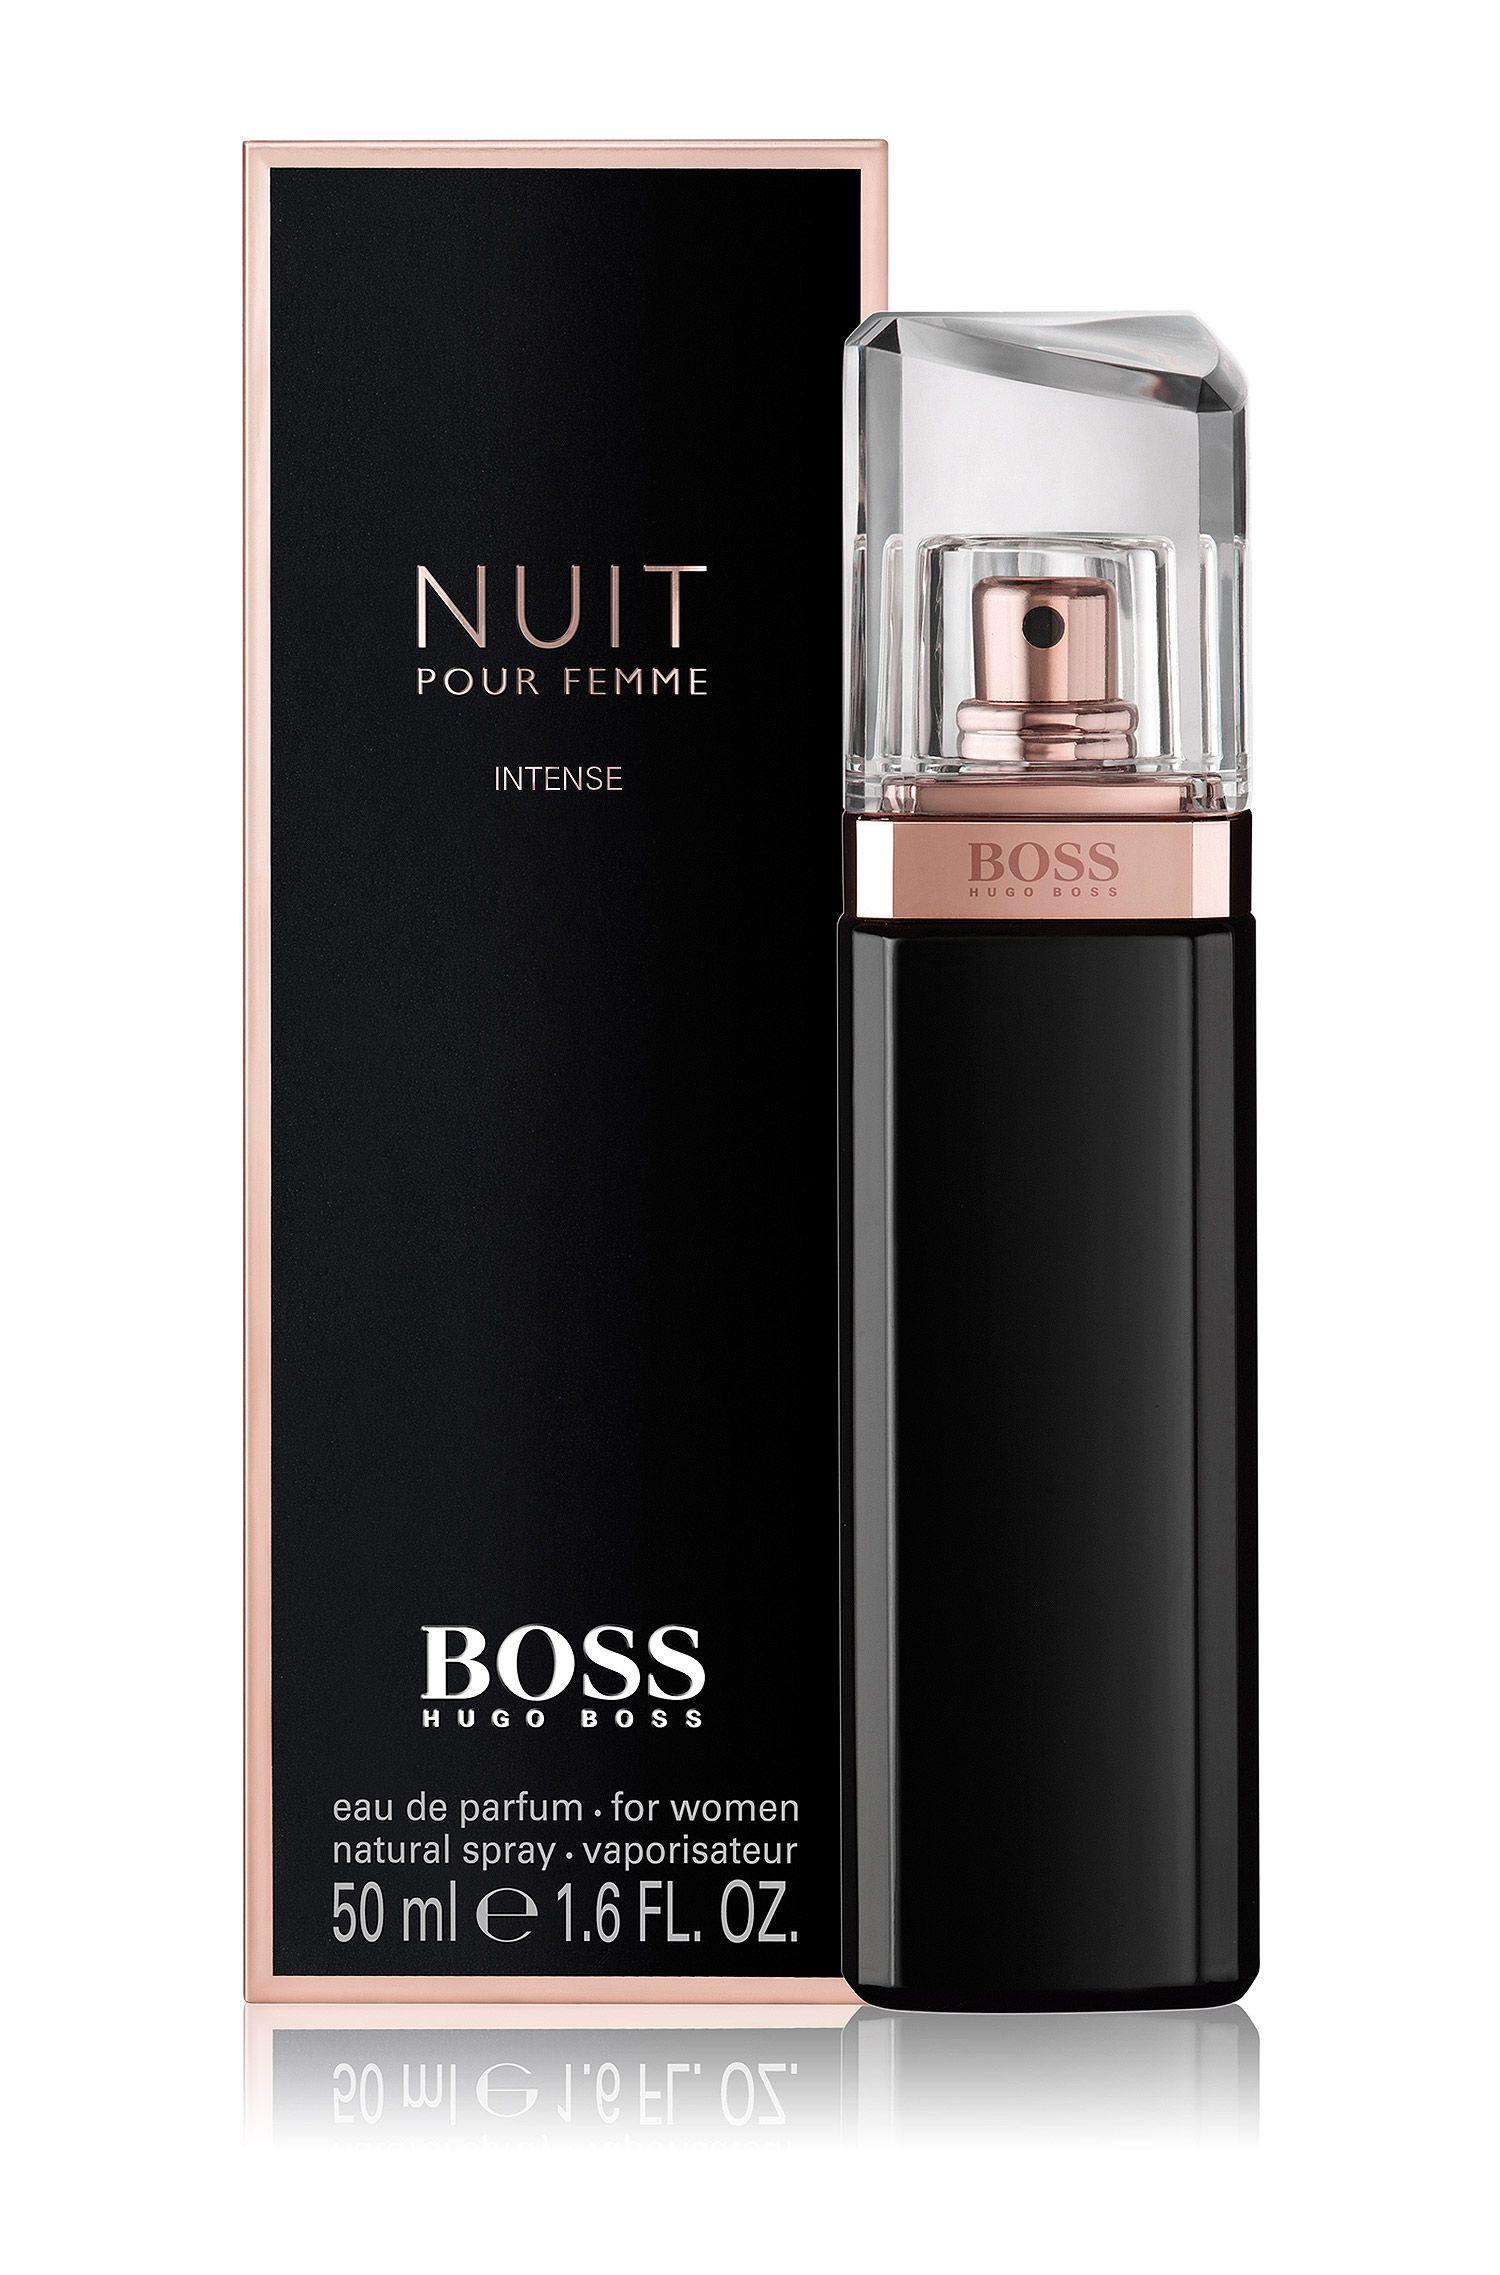 BOSS Nuit Intense Eau de Parfum 50 ml